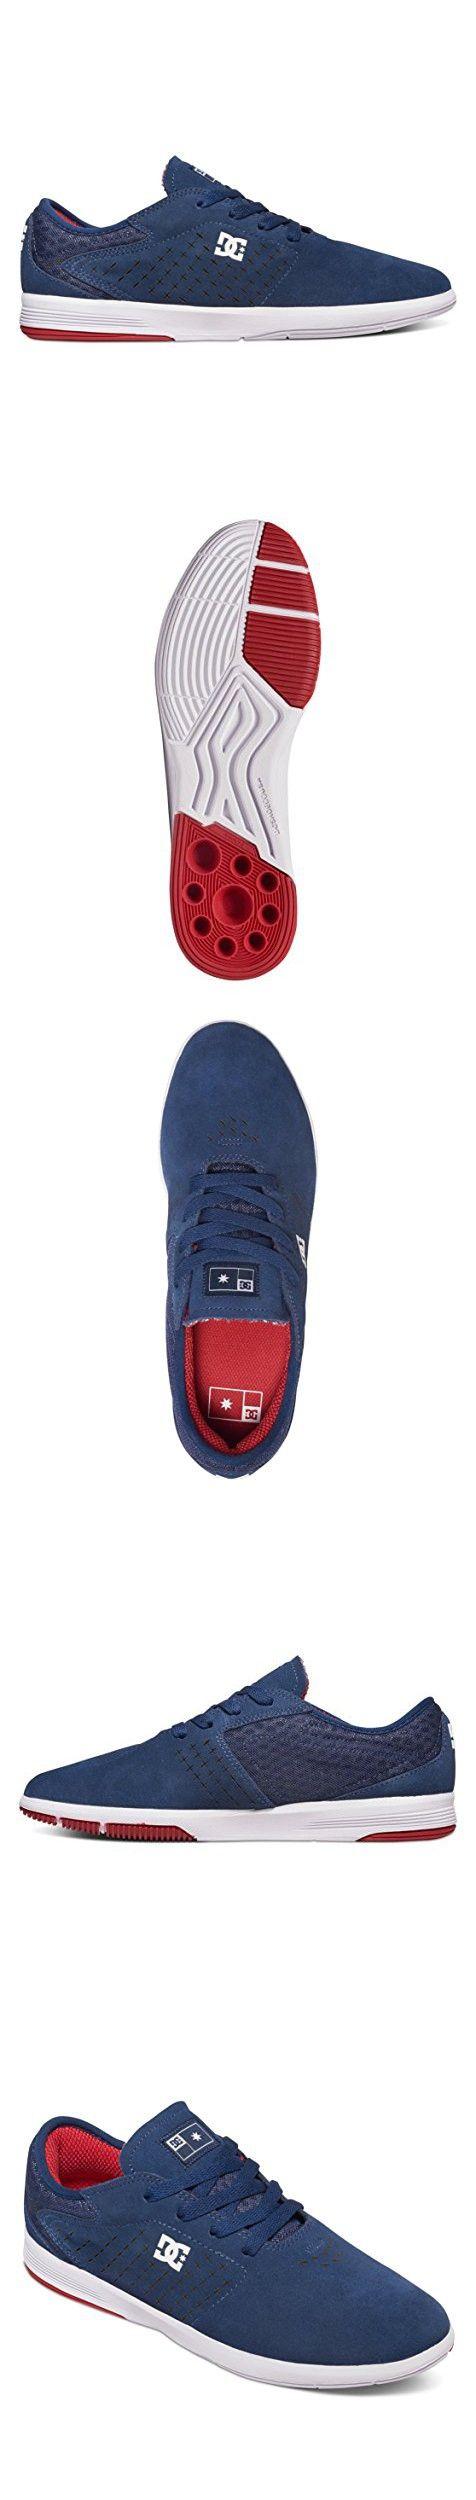 DC  Herren New Jack S Skate  Schuhes, Navy, 10D   Skate DC Schuhes  Herren Schuhes ... 07c45a